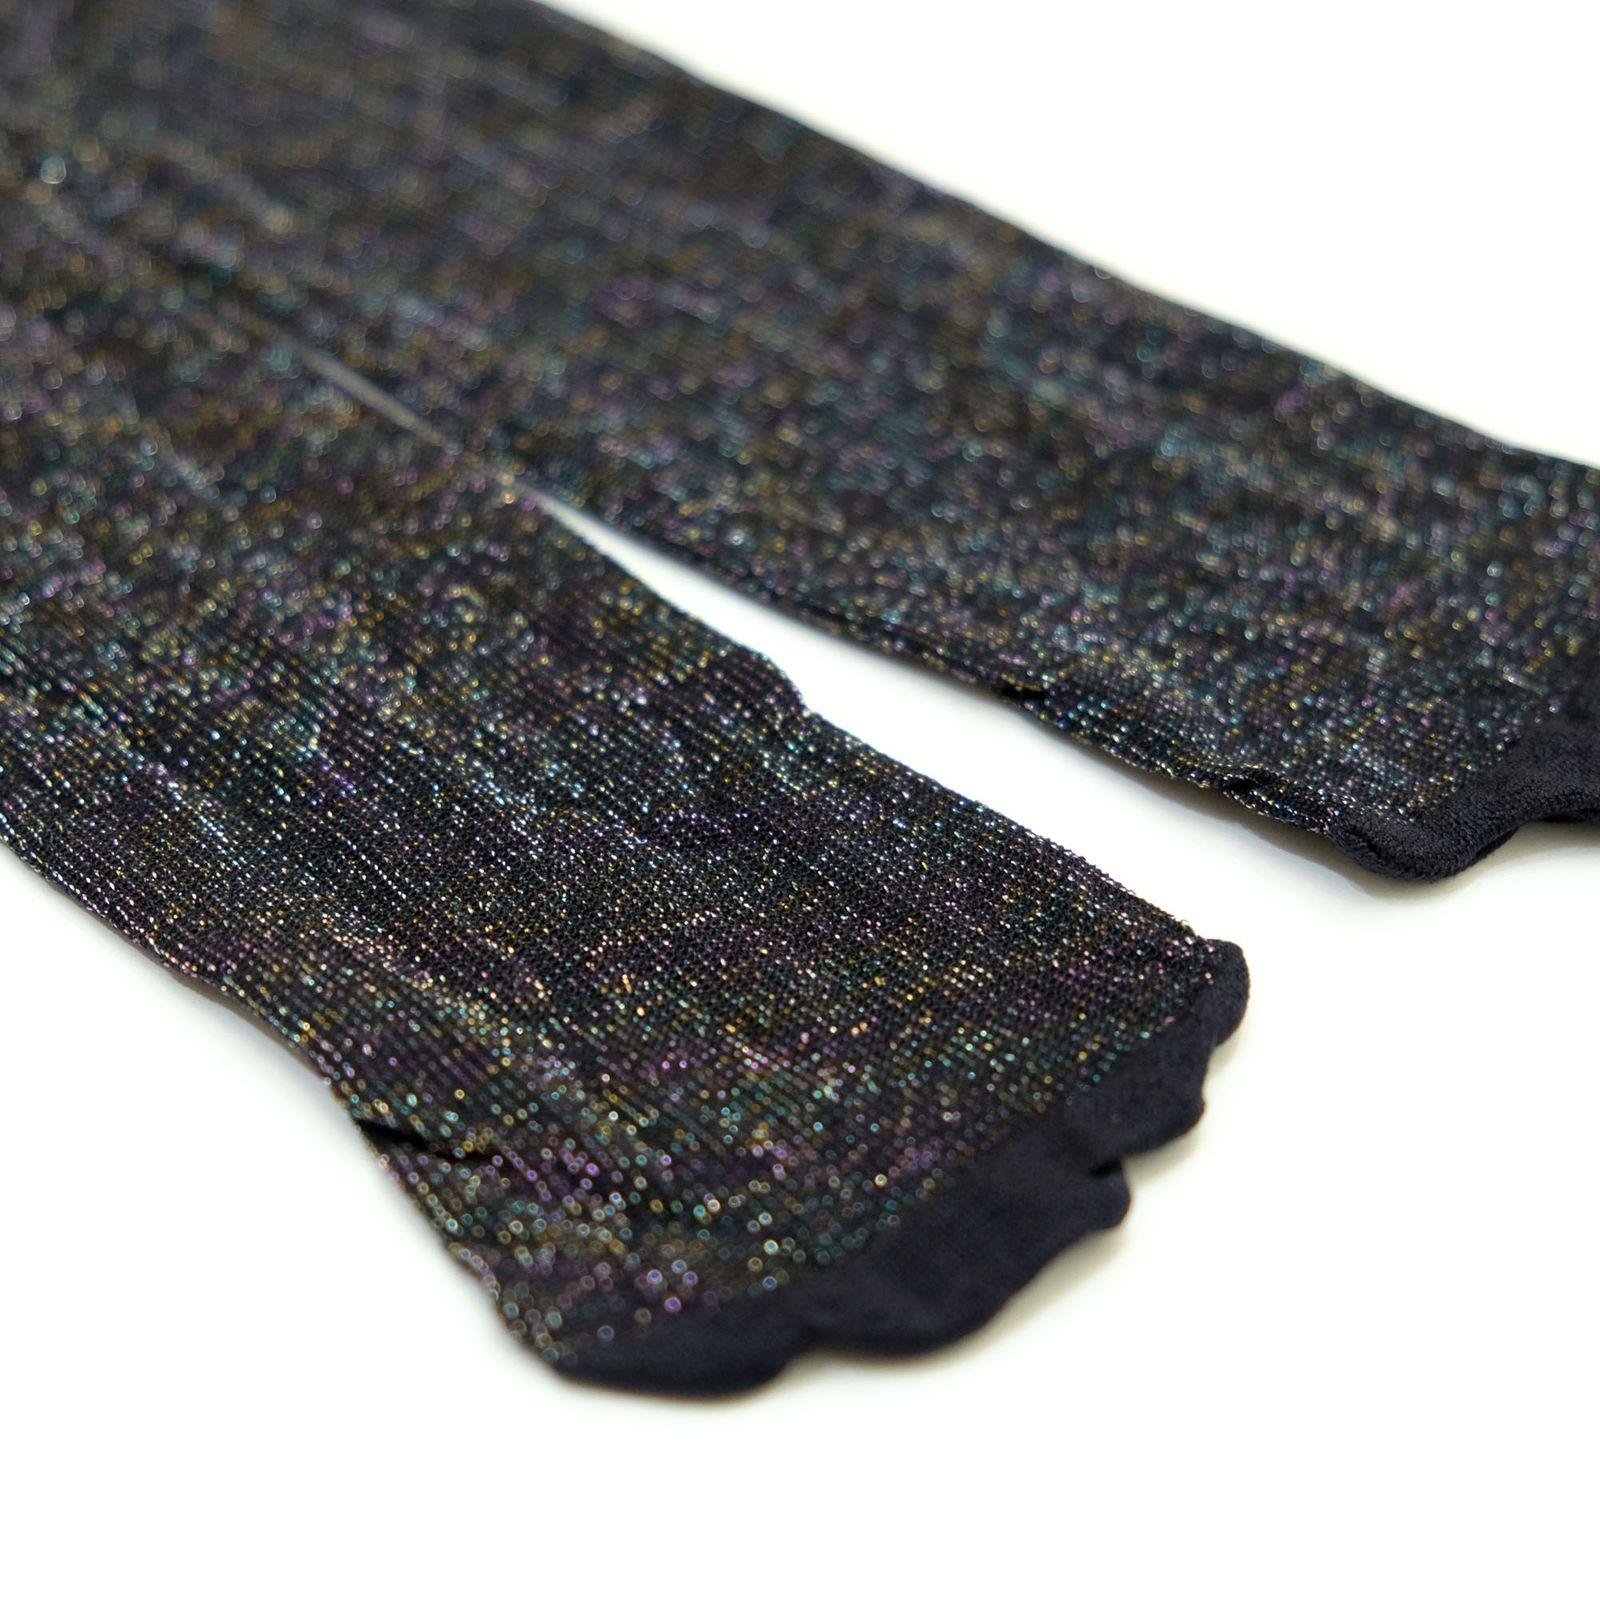 جوراب شلواری دخترانه ال سی وایکیکی کد 9WQ472Z1 -  - 3